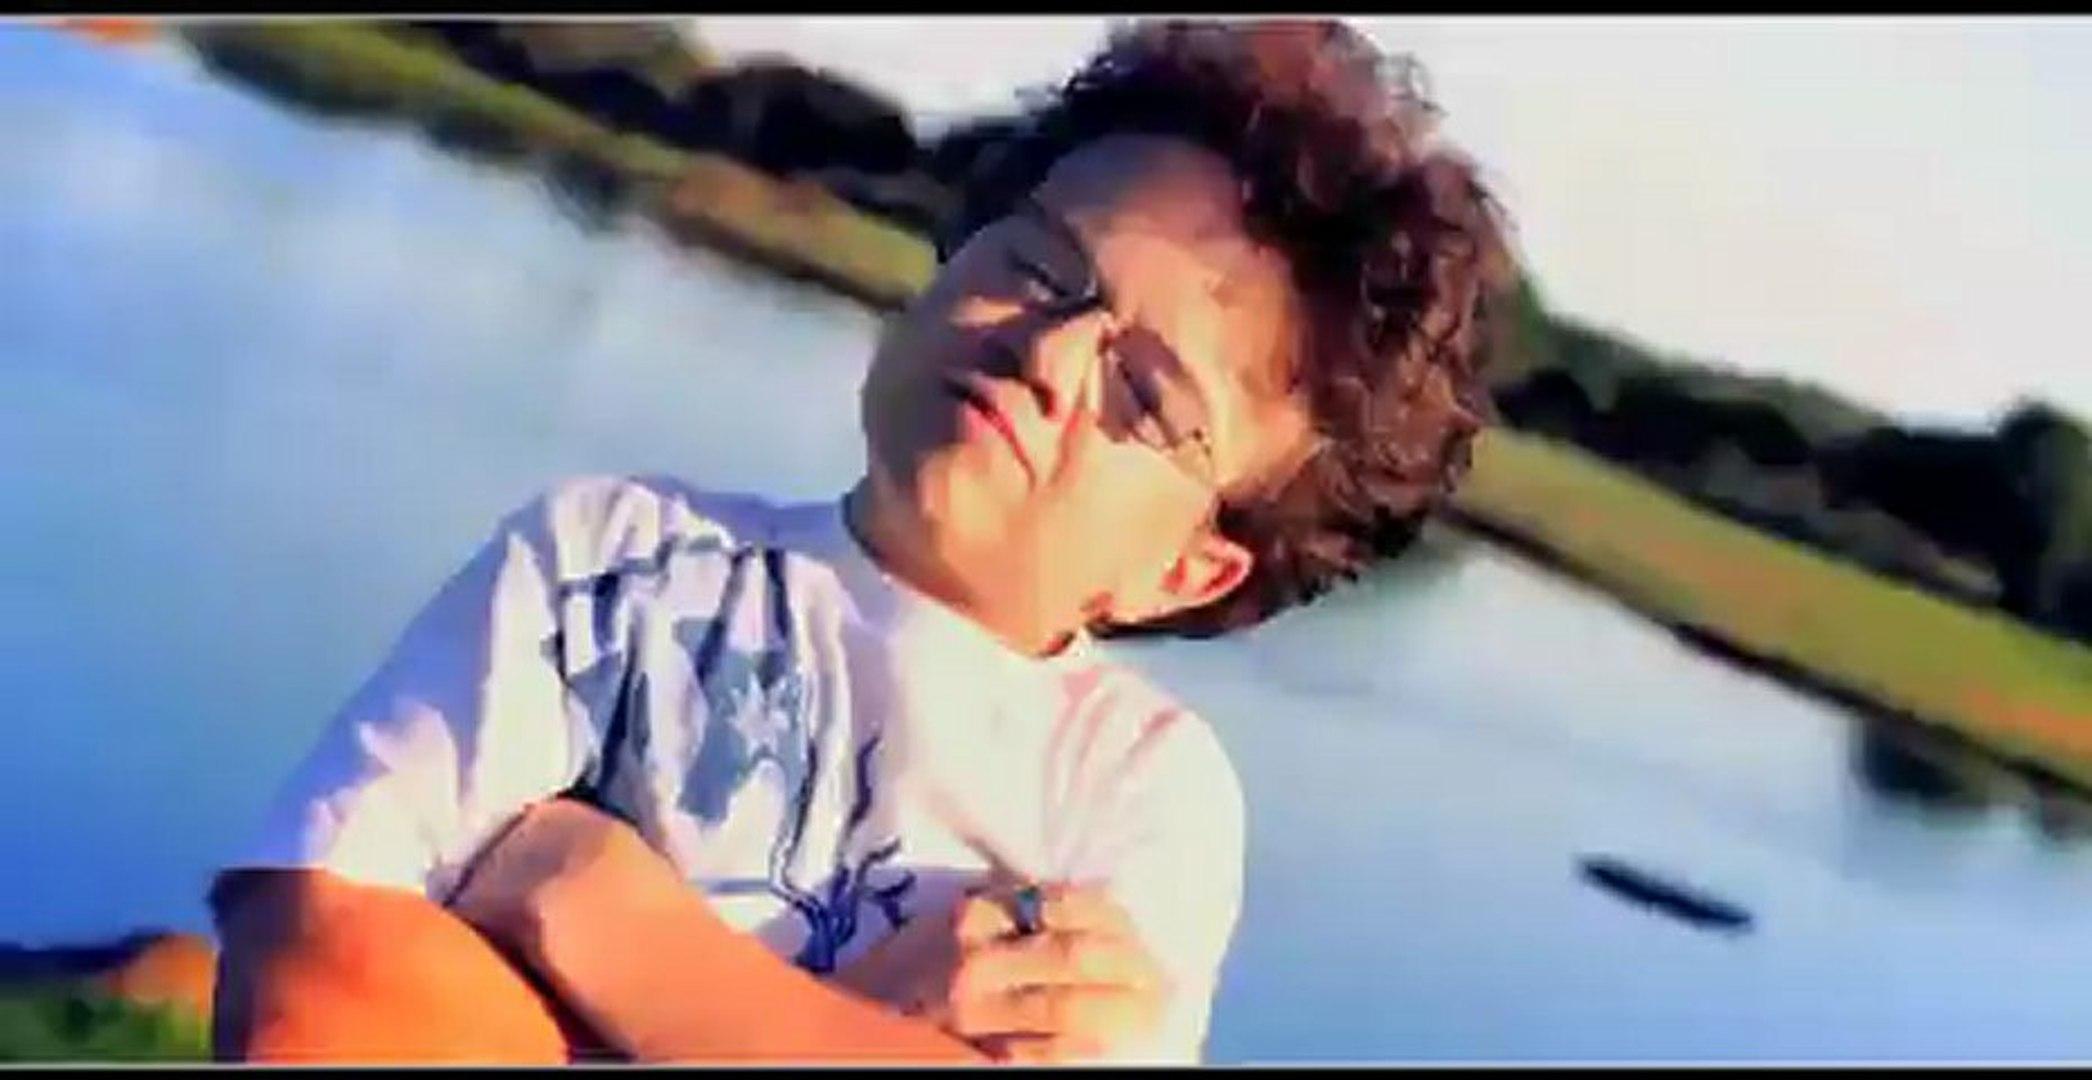 Tonight - Official Music Video (DJ Oriska Featuring Keenan Cahill & Doremi Fly)